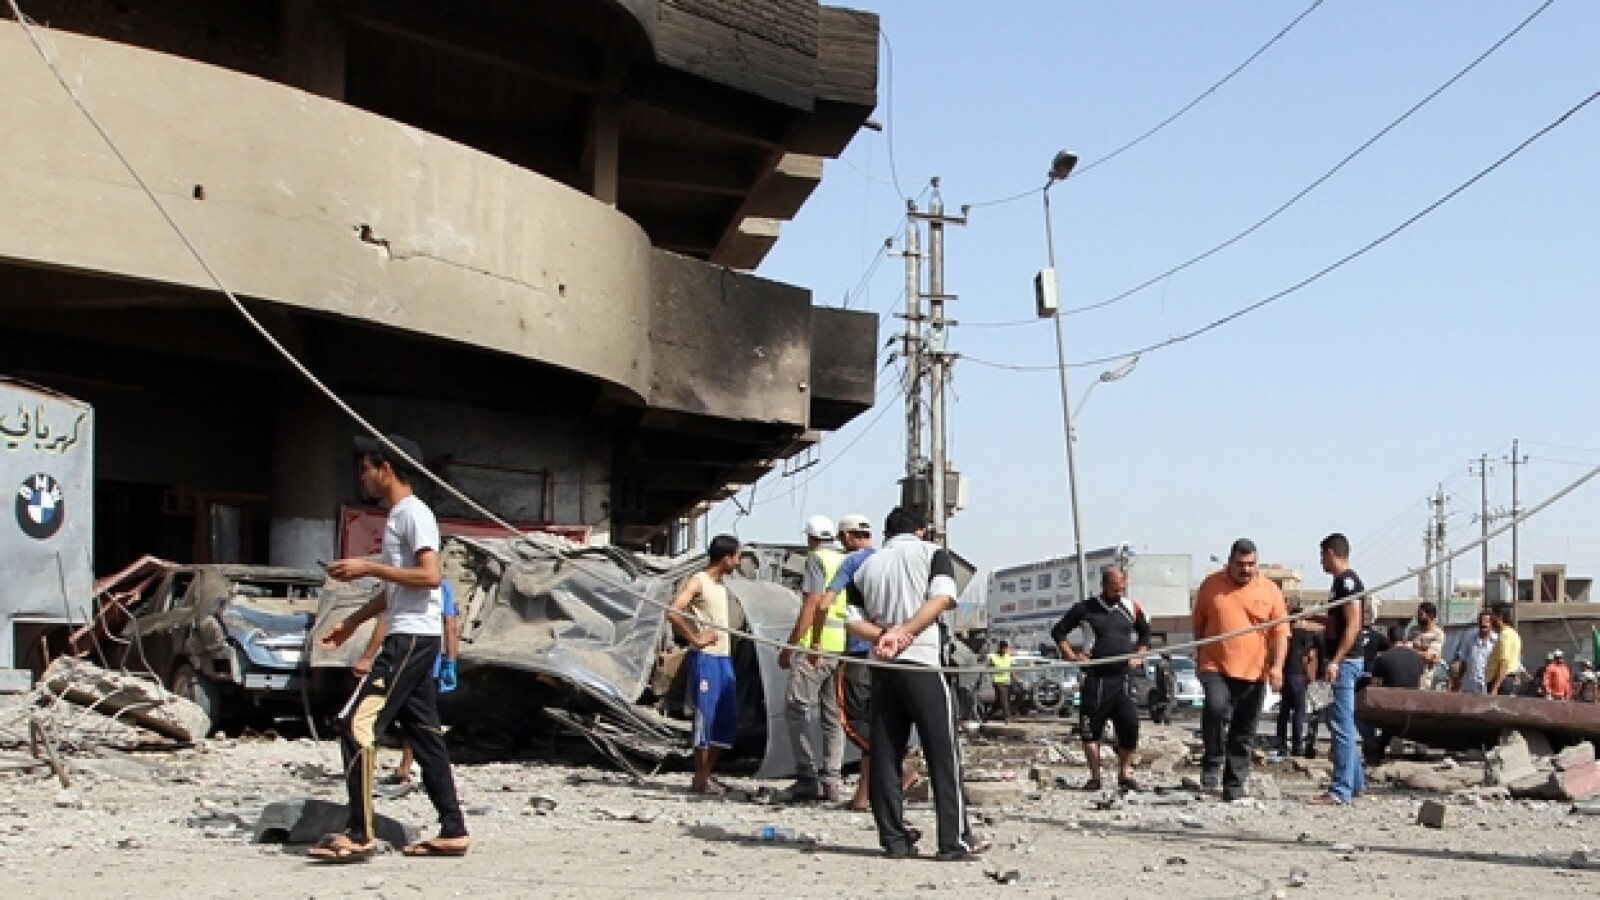 iraq bagdad chiitas peregrinos atentados coche bomba